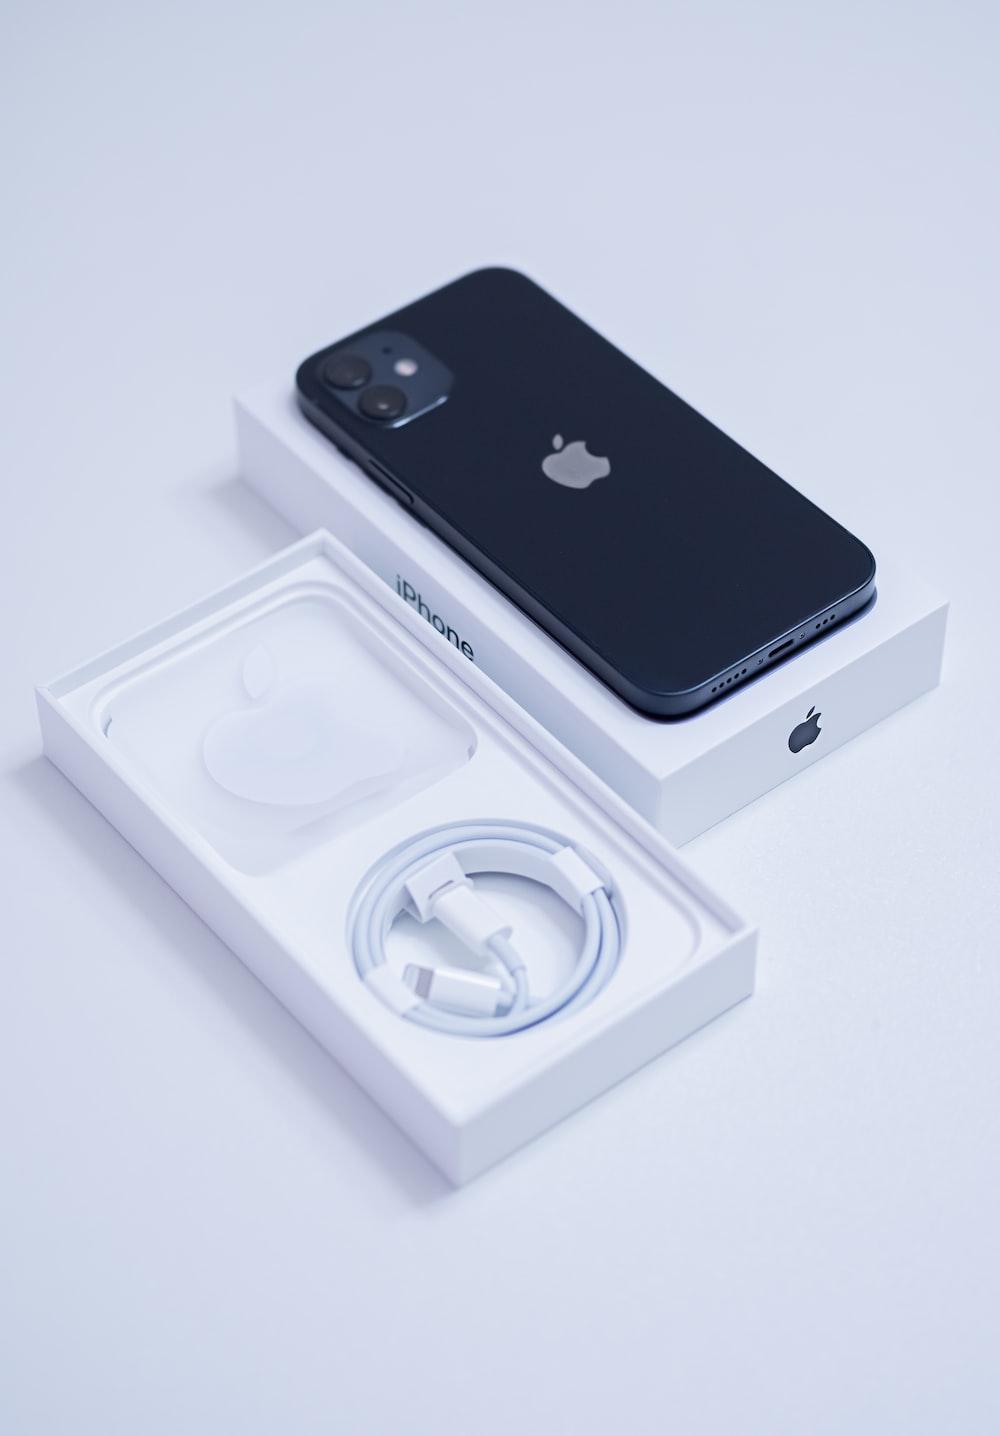 black iphone 7 on white box